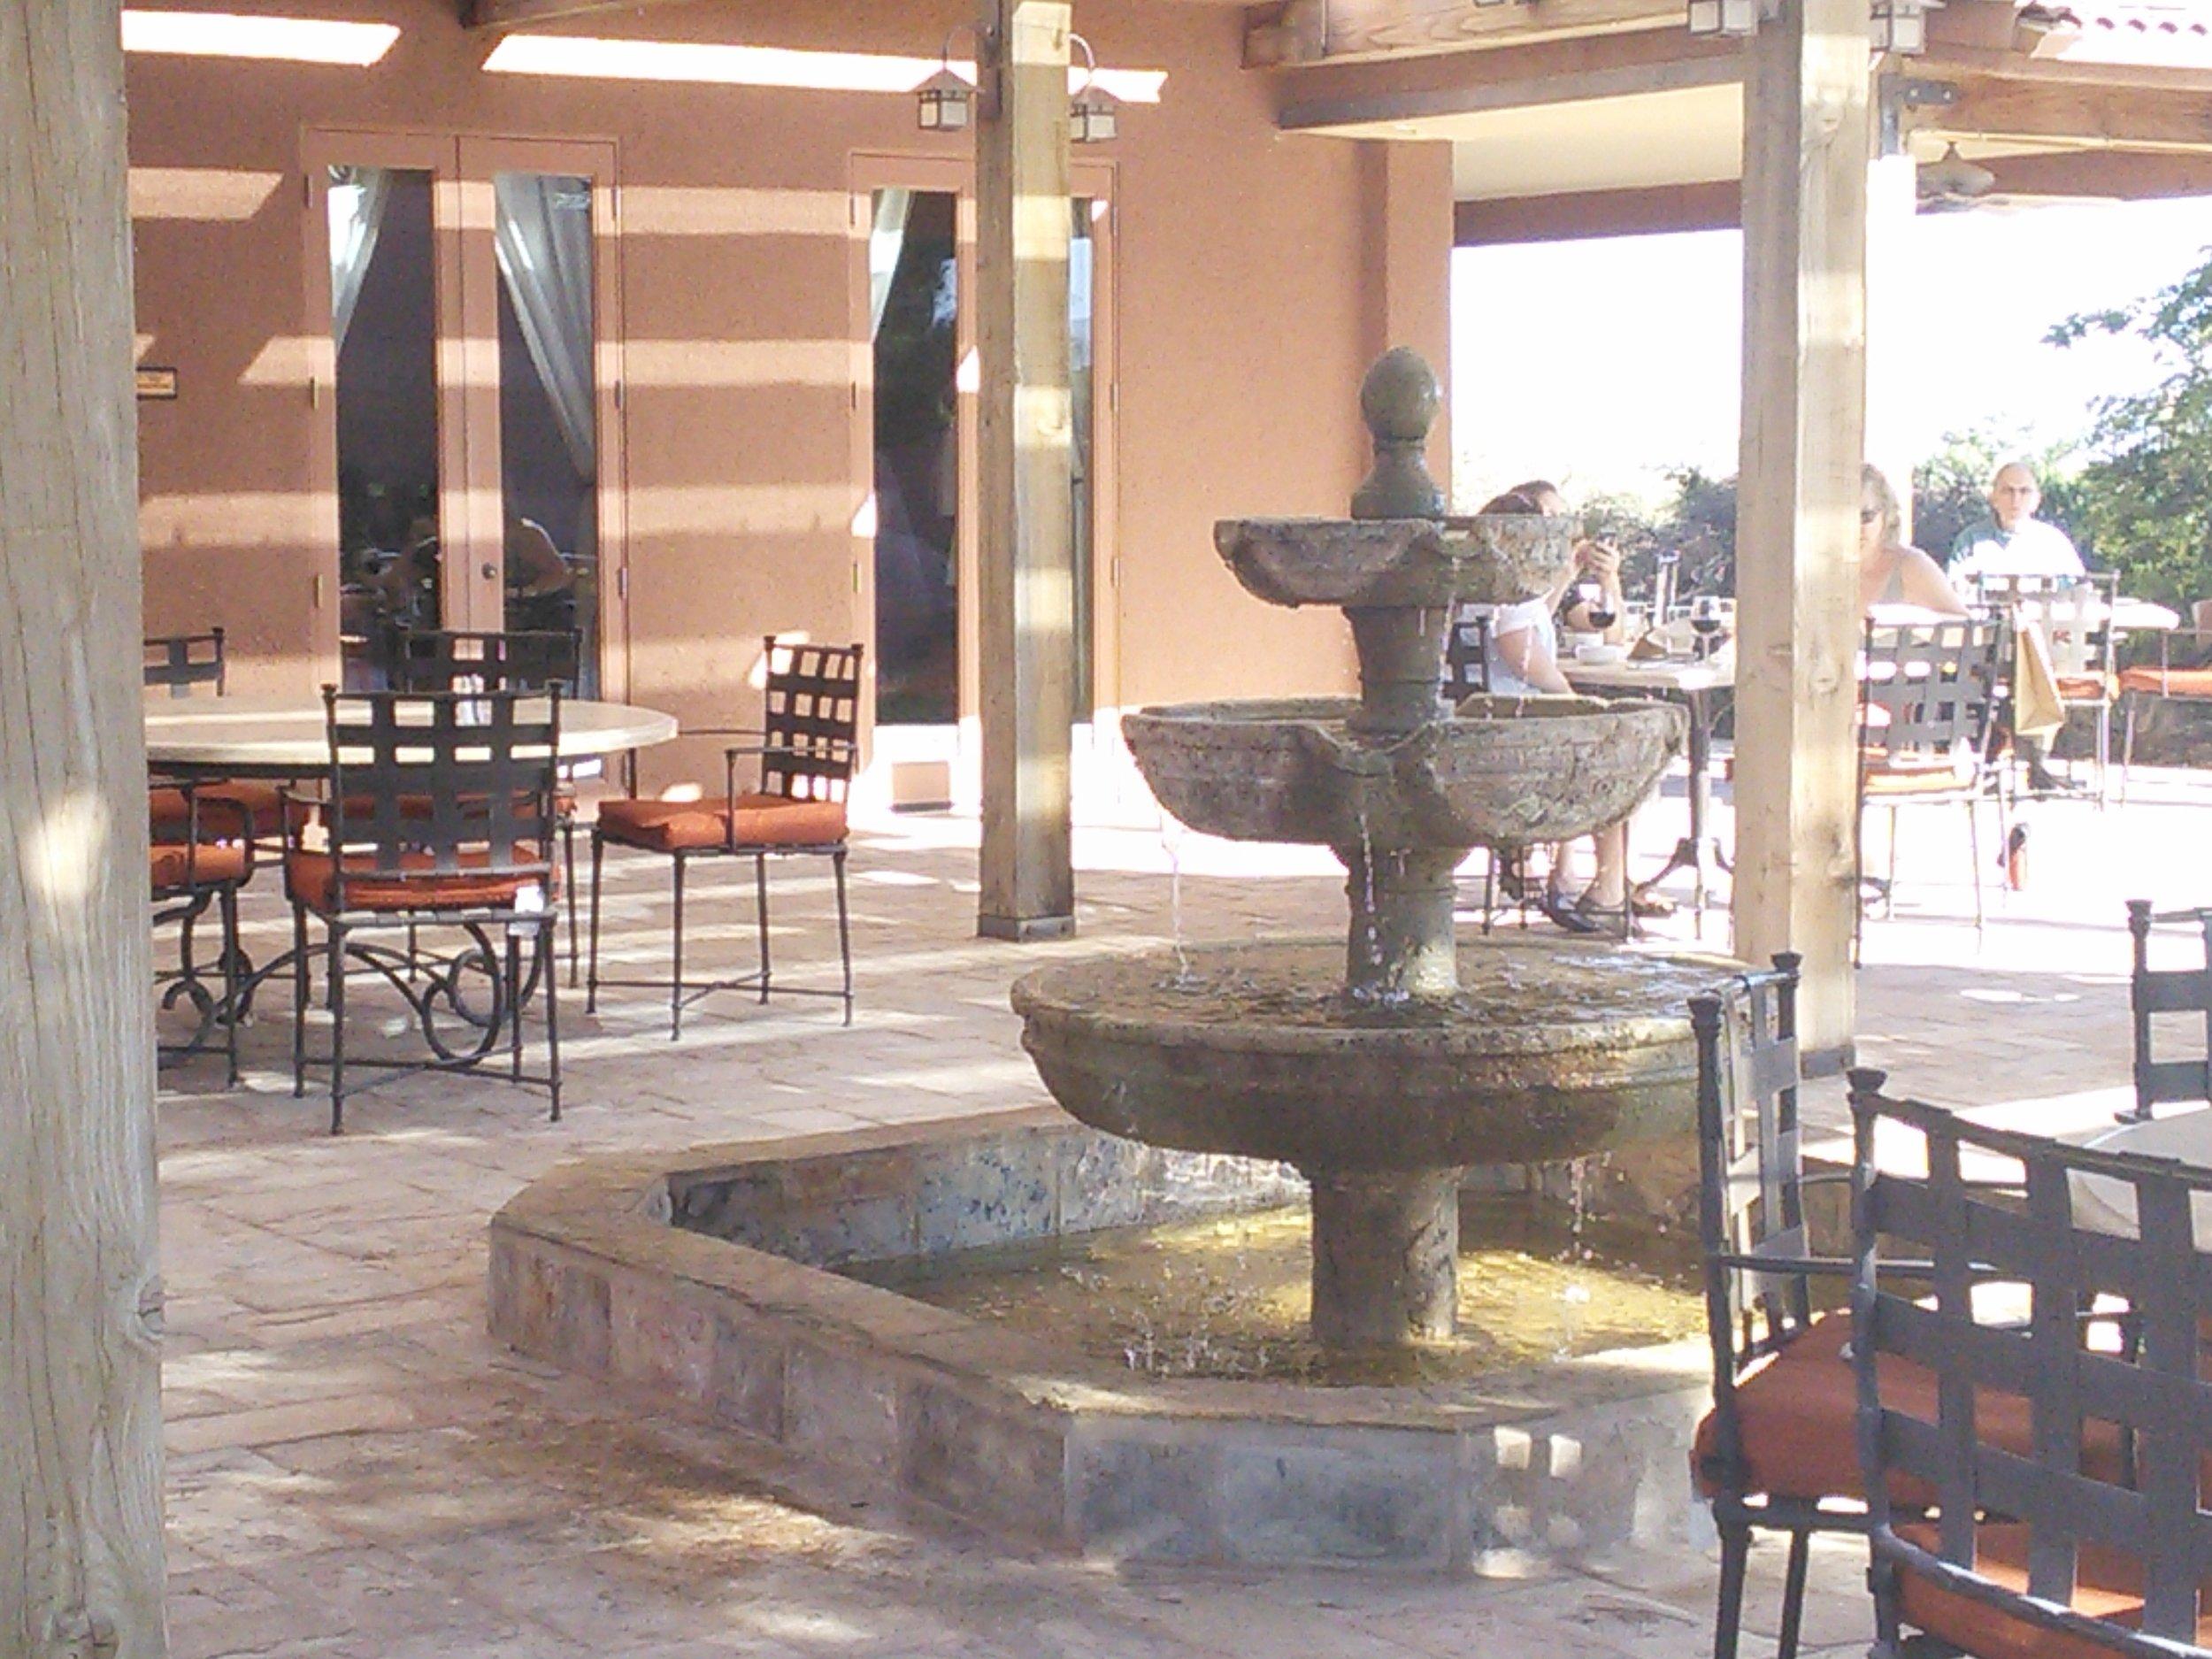 red mountain resort, jeri Donovan, wellness vacation, wellness travel